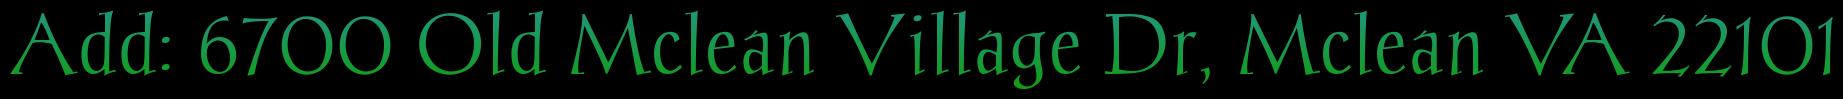 Add: 6700 Old Mclean Village Dr, Mclean VA 22101